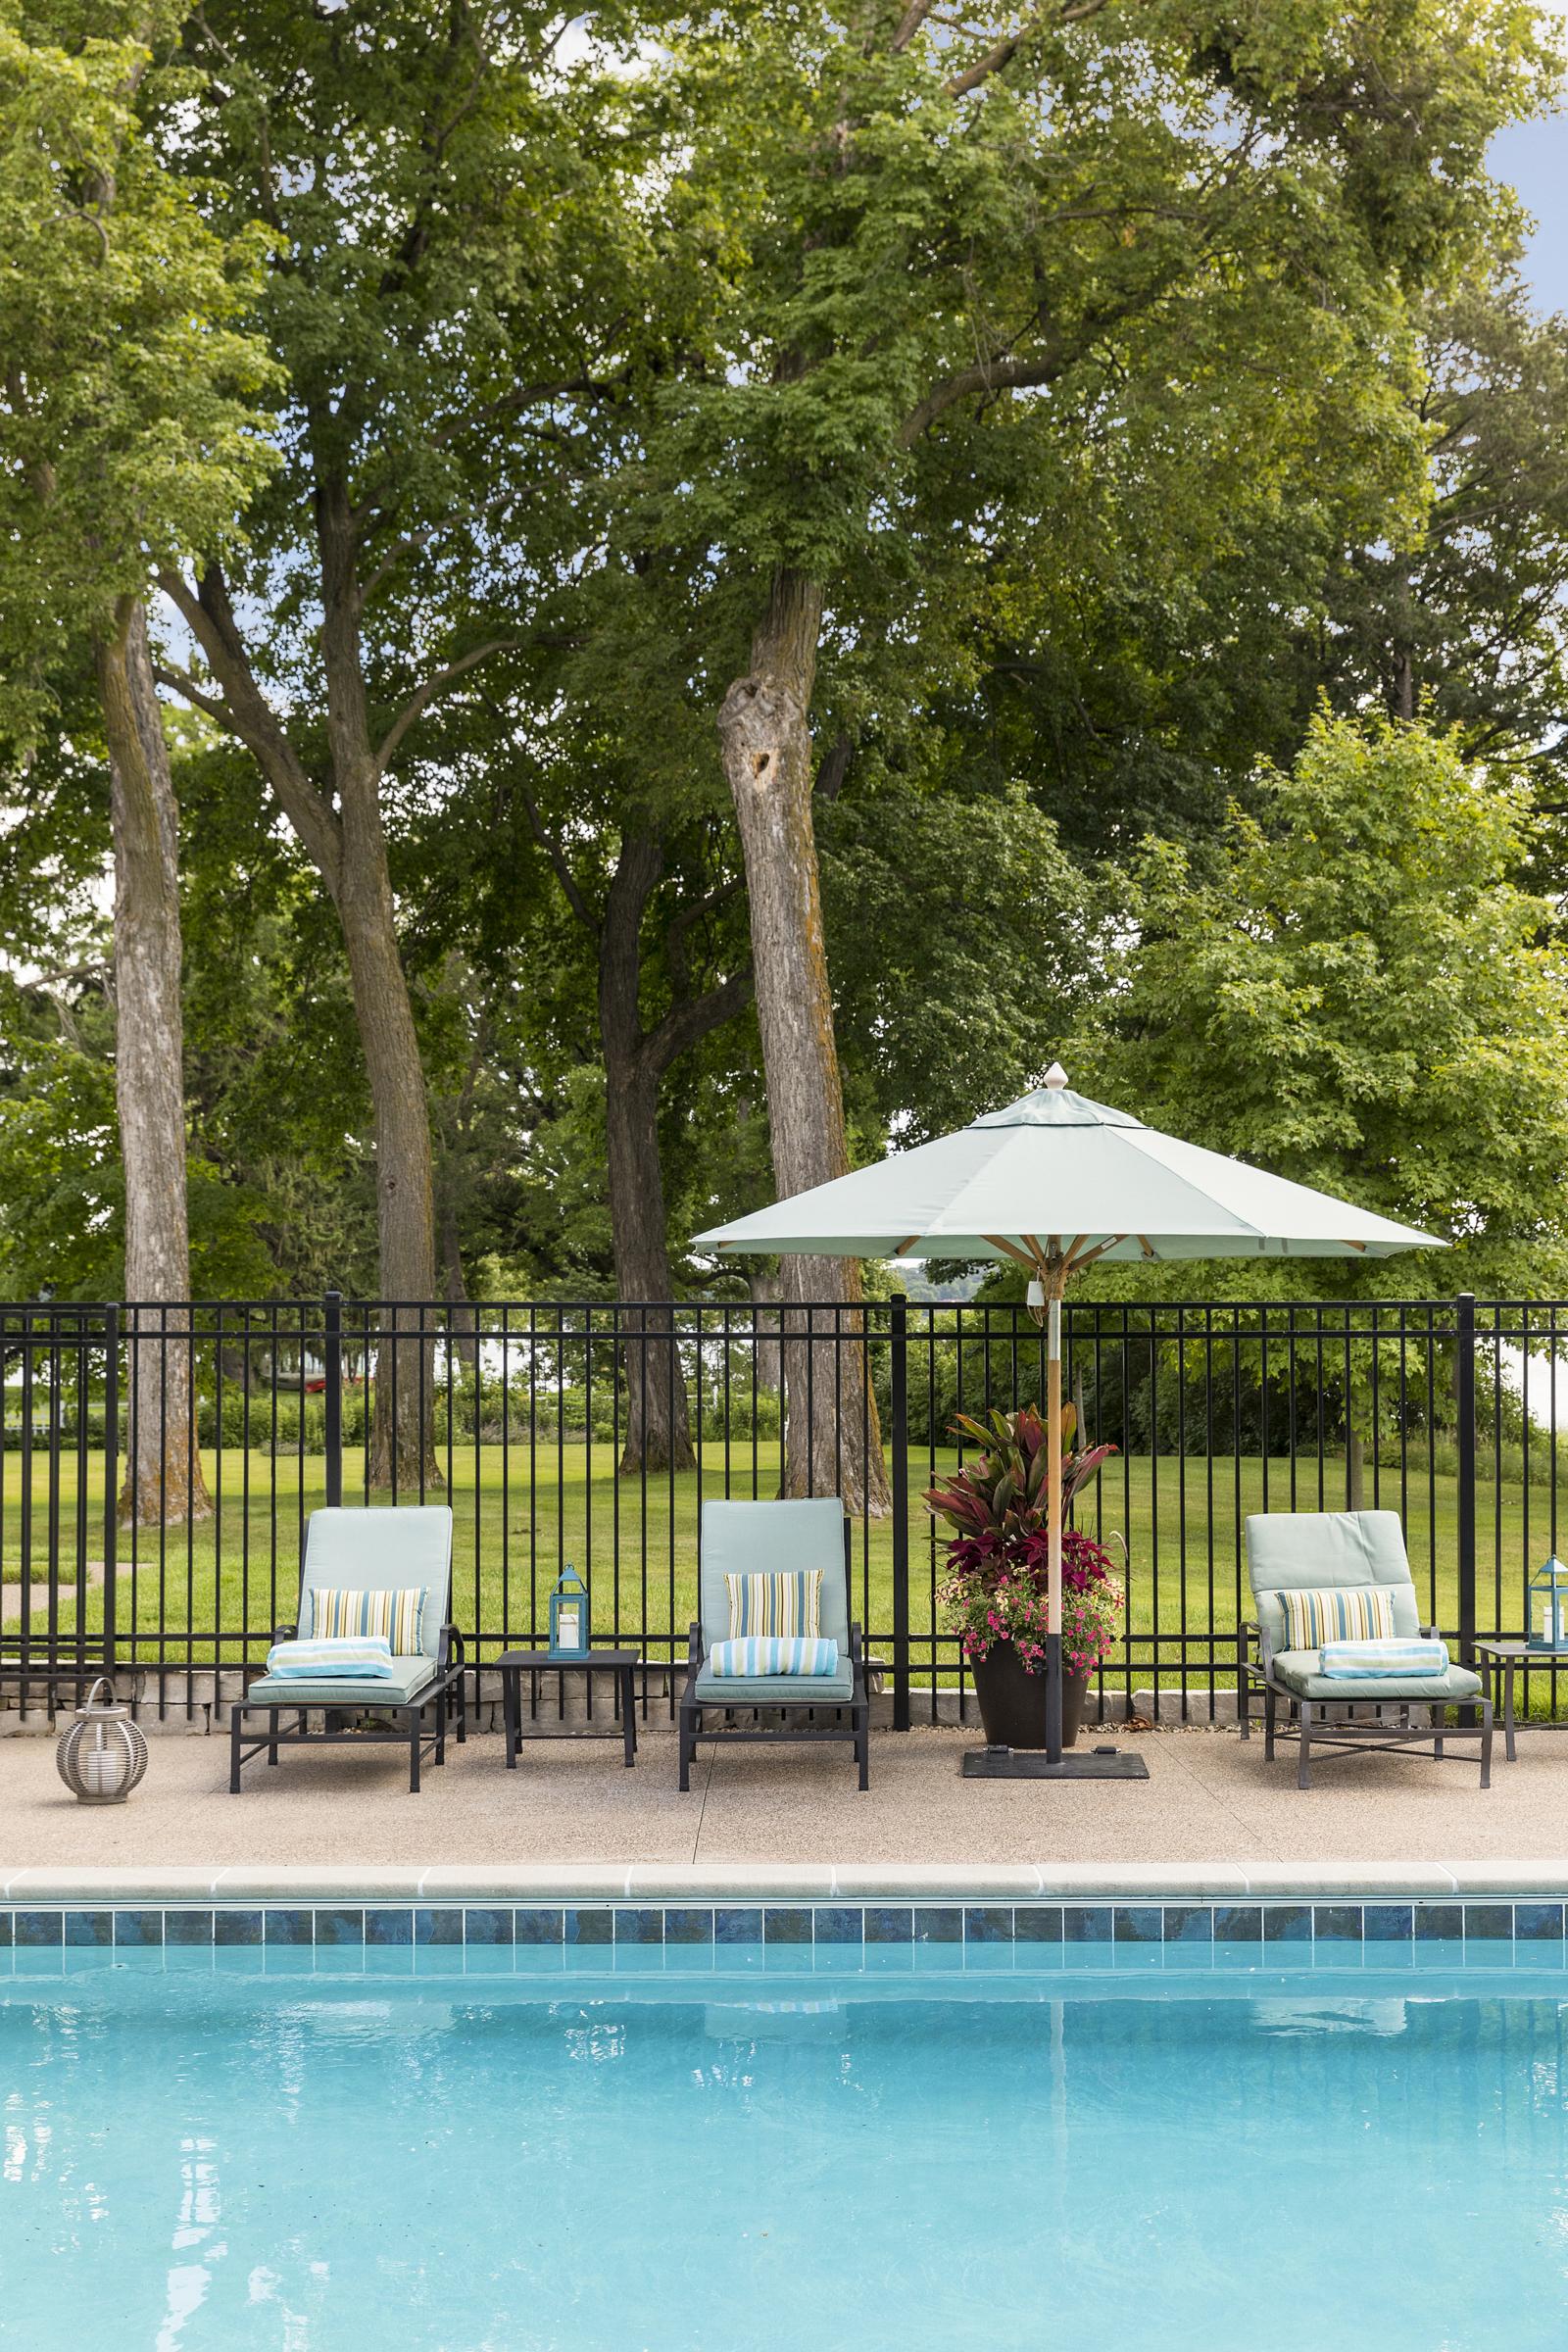 Pool area designed by NewStudio Architecture complements landscape design